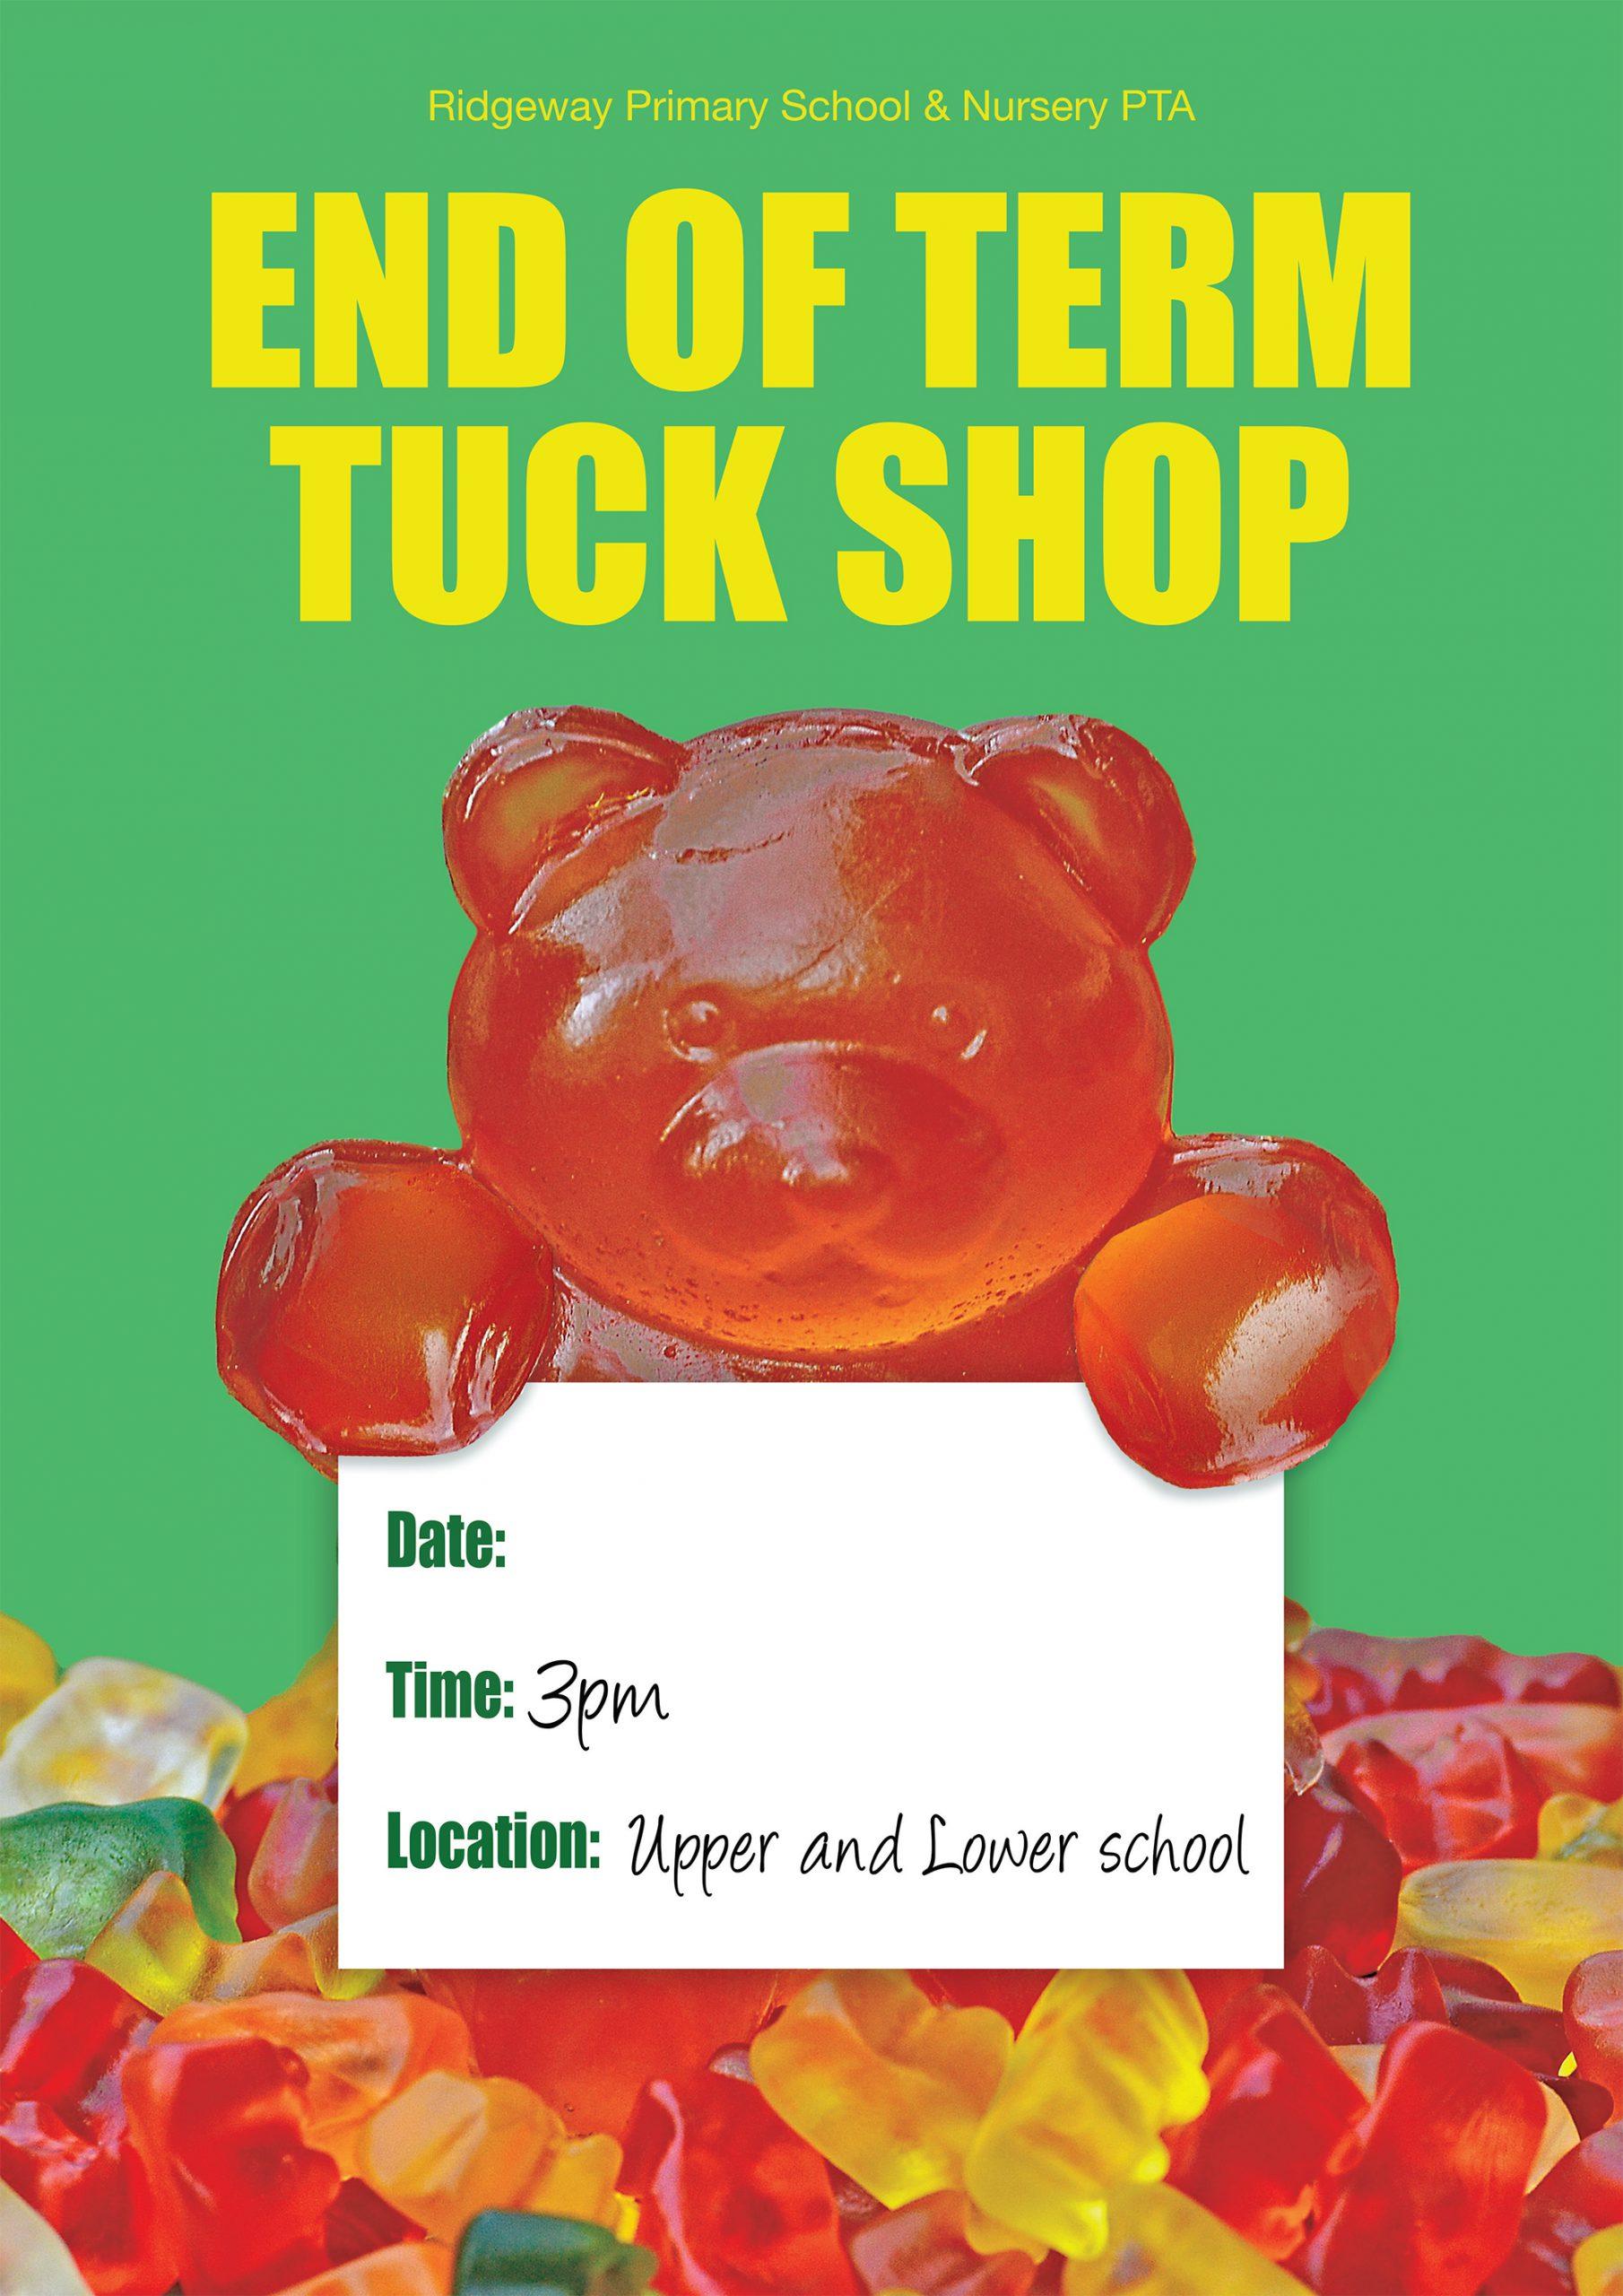 Tuck shop poster